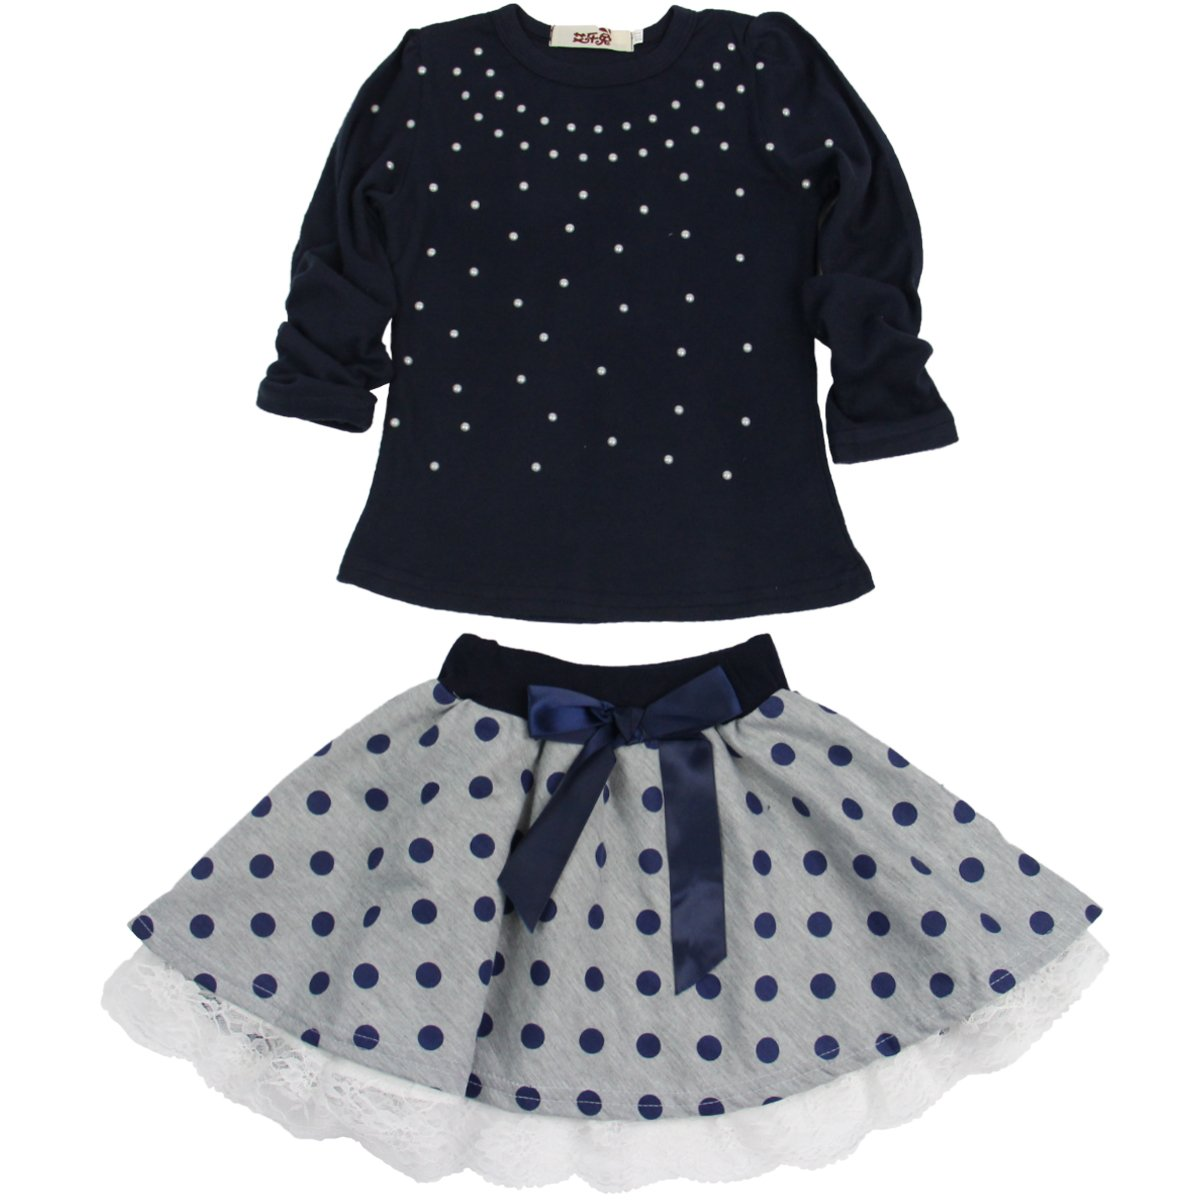 Jastore Kids Girl Cute 2PCS Diamond Clothing Set Long Sleeve Top +Dot Tutu Skirt,Blue,6T